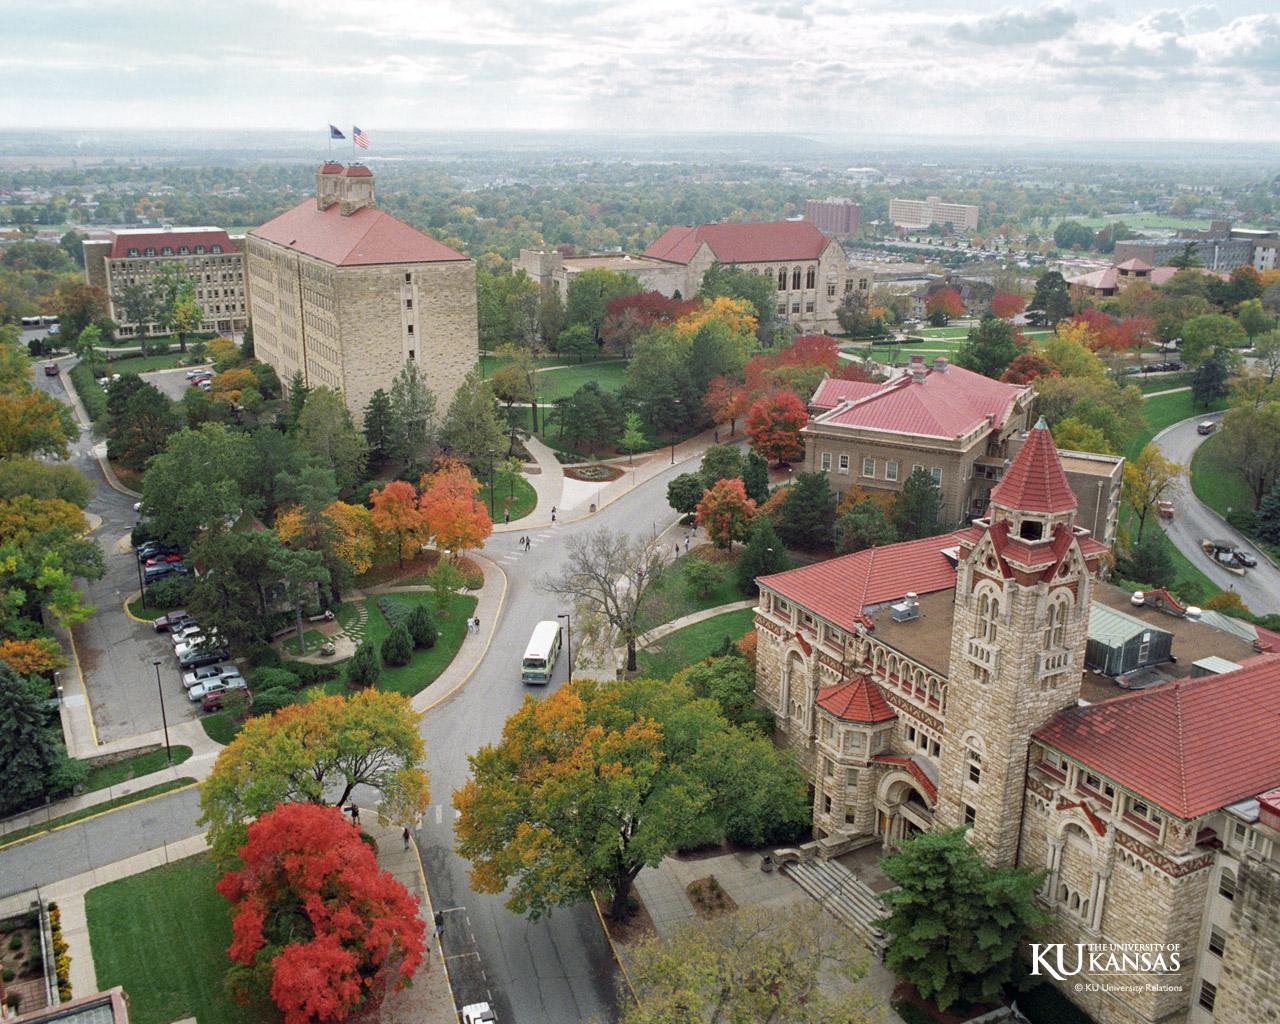 KU University of Kansas